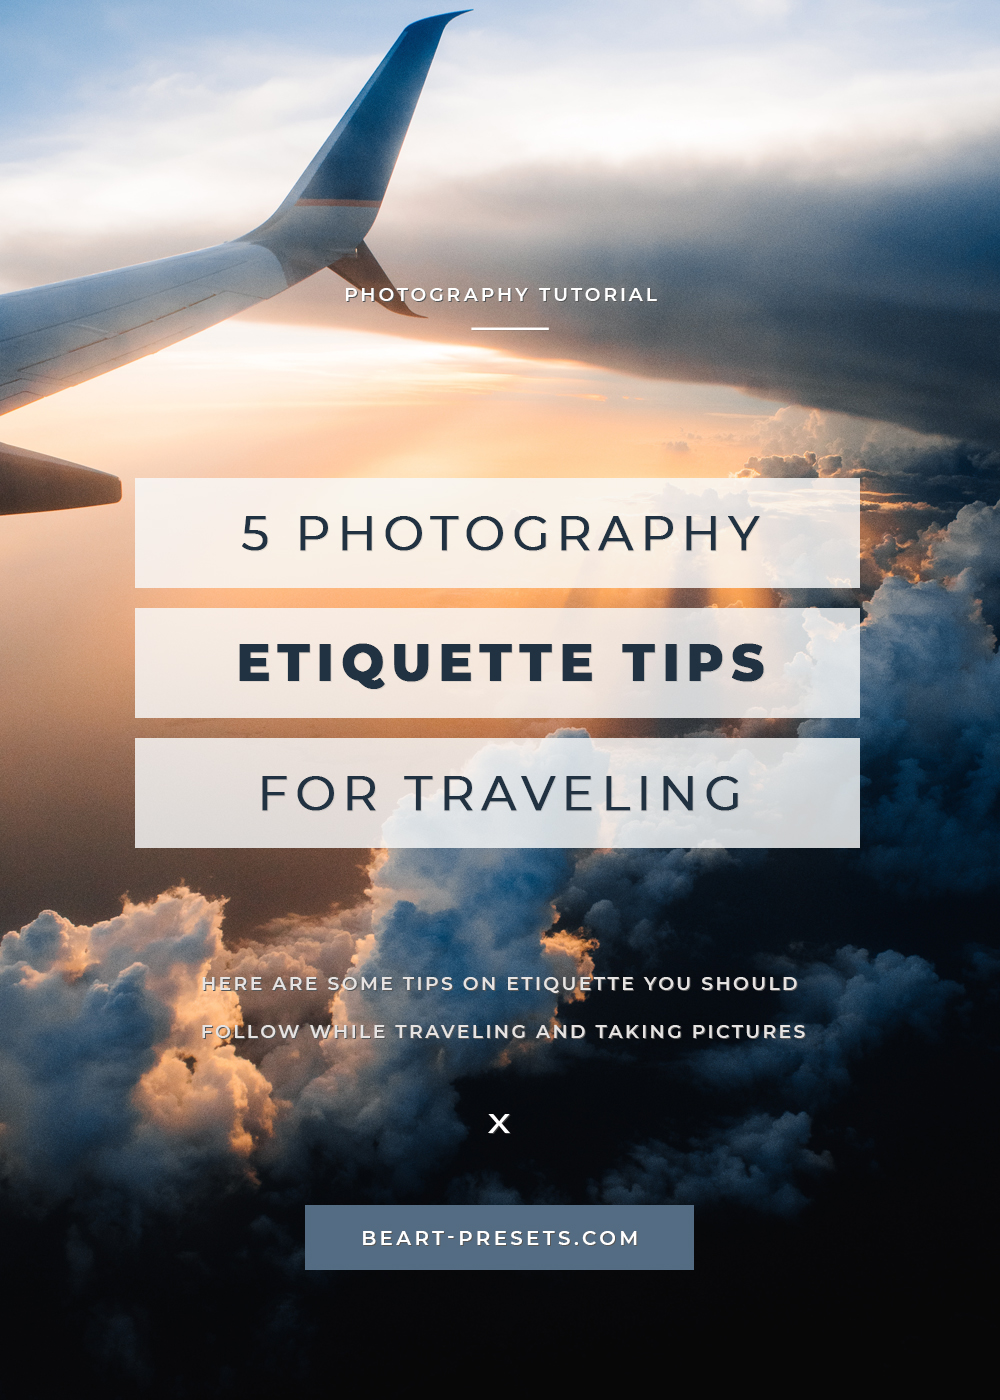 etiquette tips for traveling